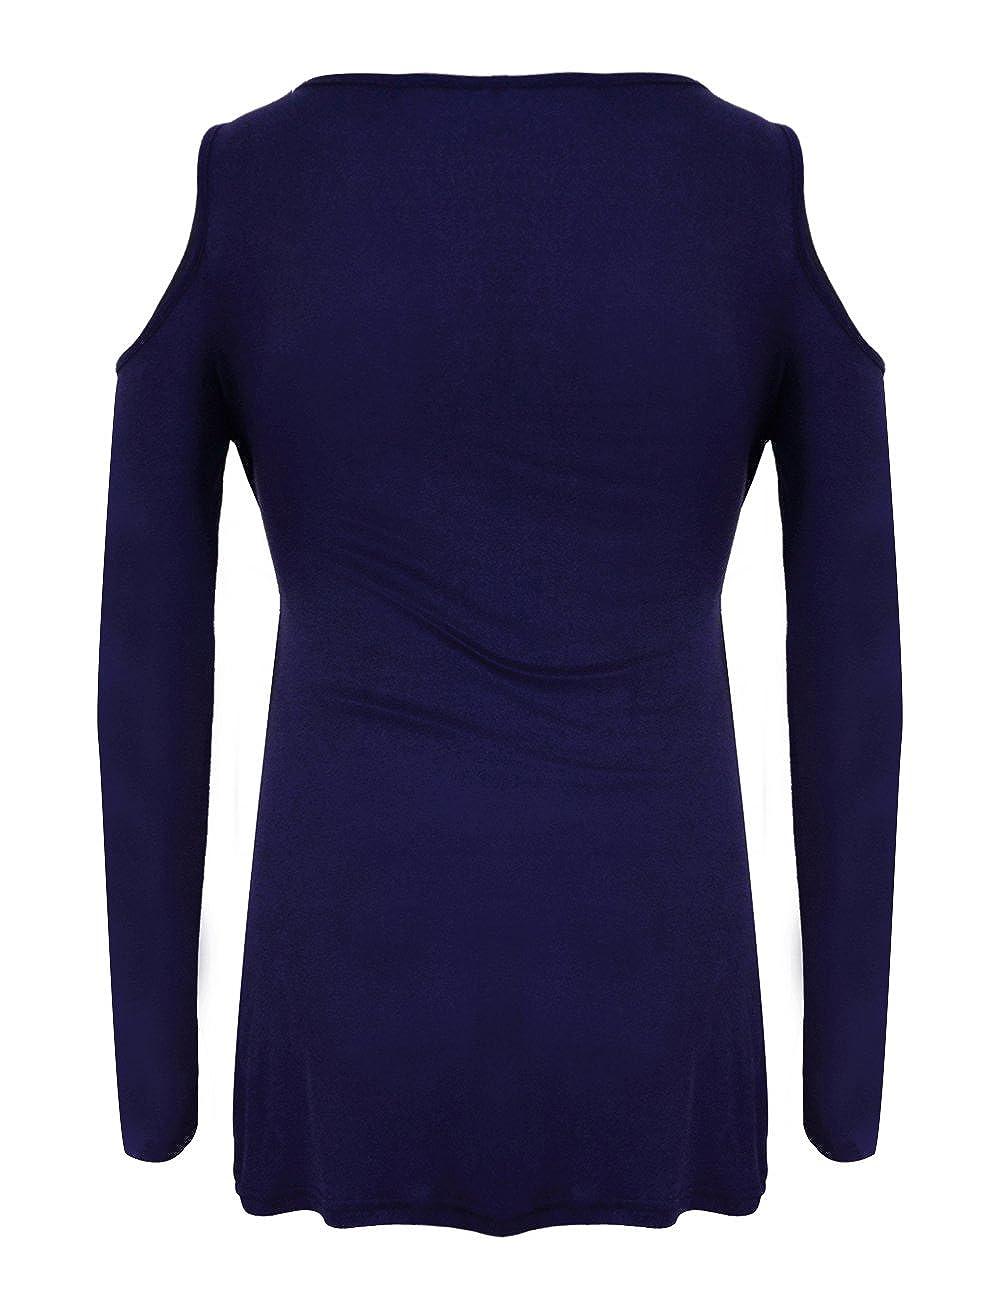 Mujer Blusa Tirante Hombro Descubierto Elástico Manga Larga Tunica Tops Camiseta Moda (m, Azul): Amazon.es: Ropa y accesorios